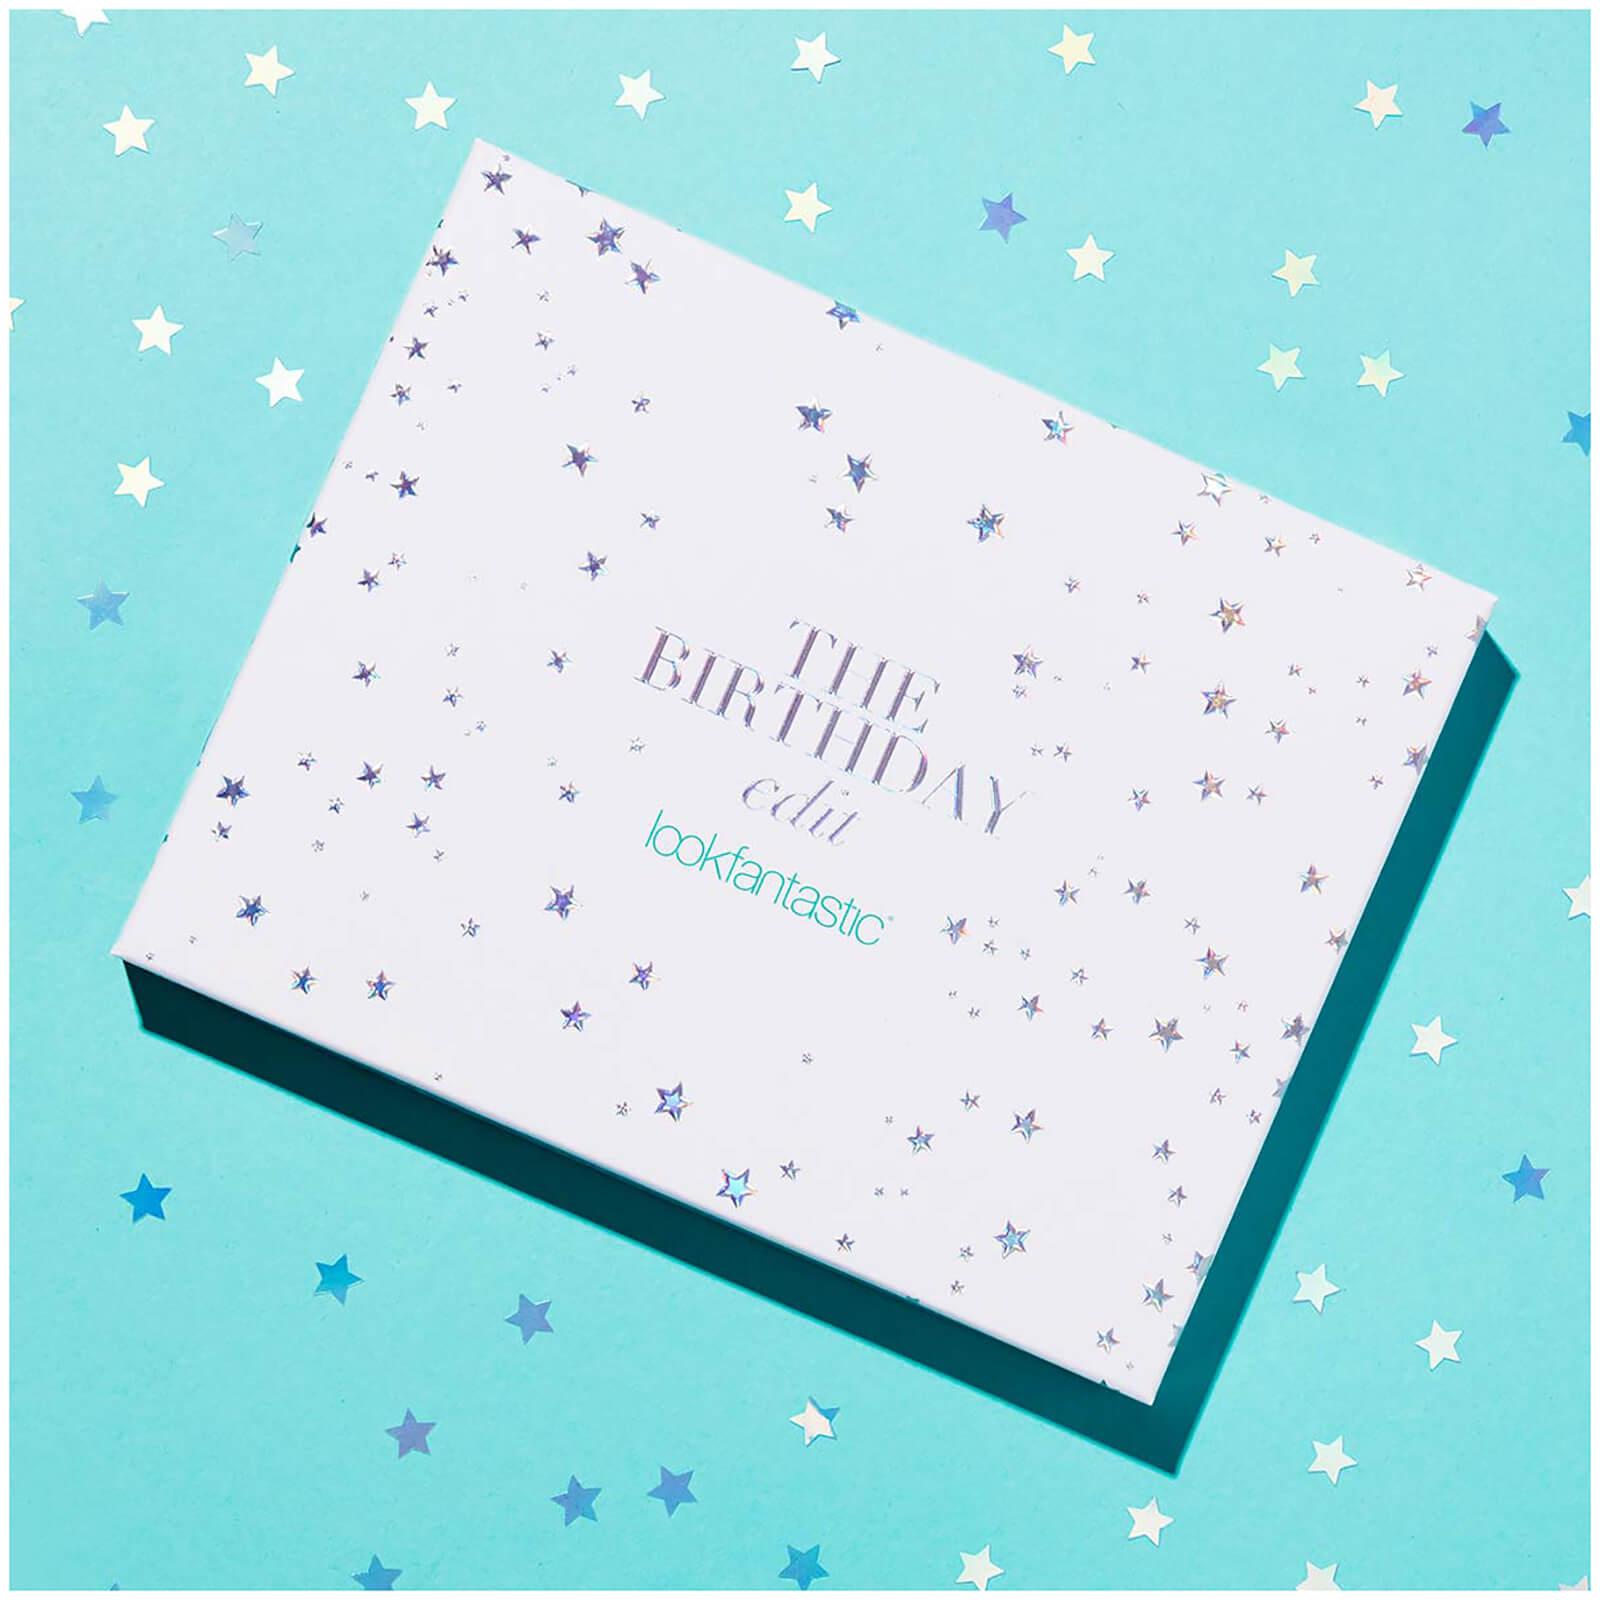 LOOKFANTASTIC 2017 年版九月美妆礼盒